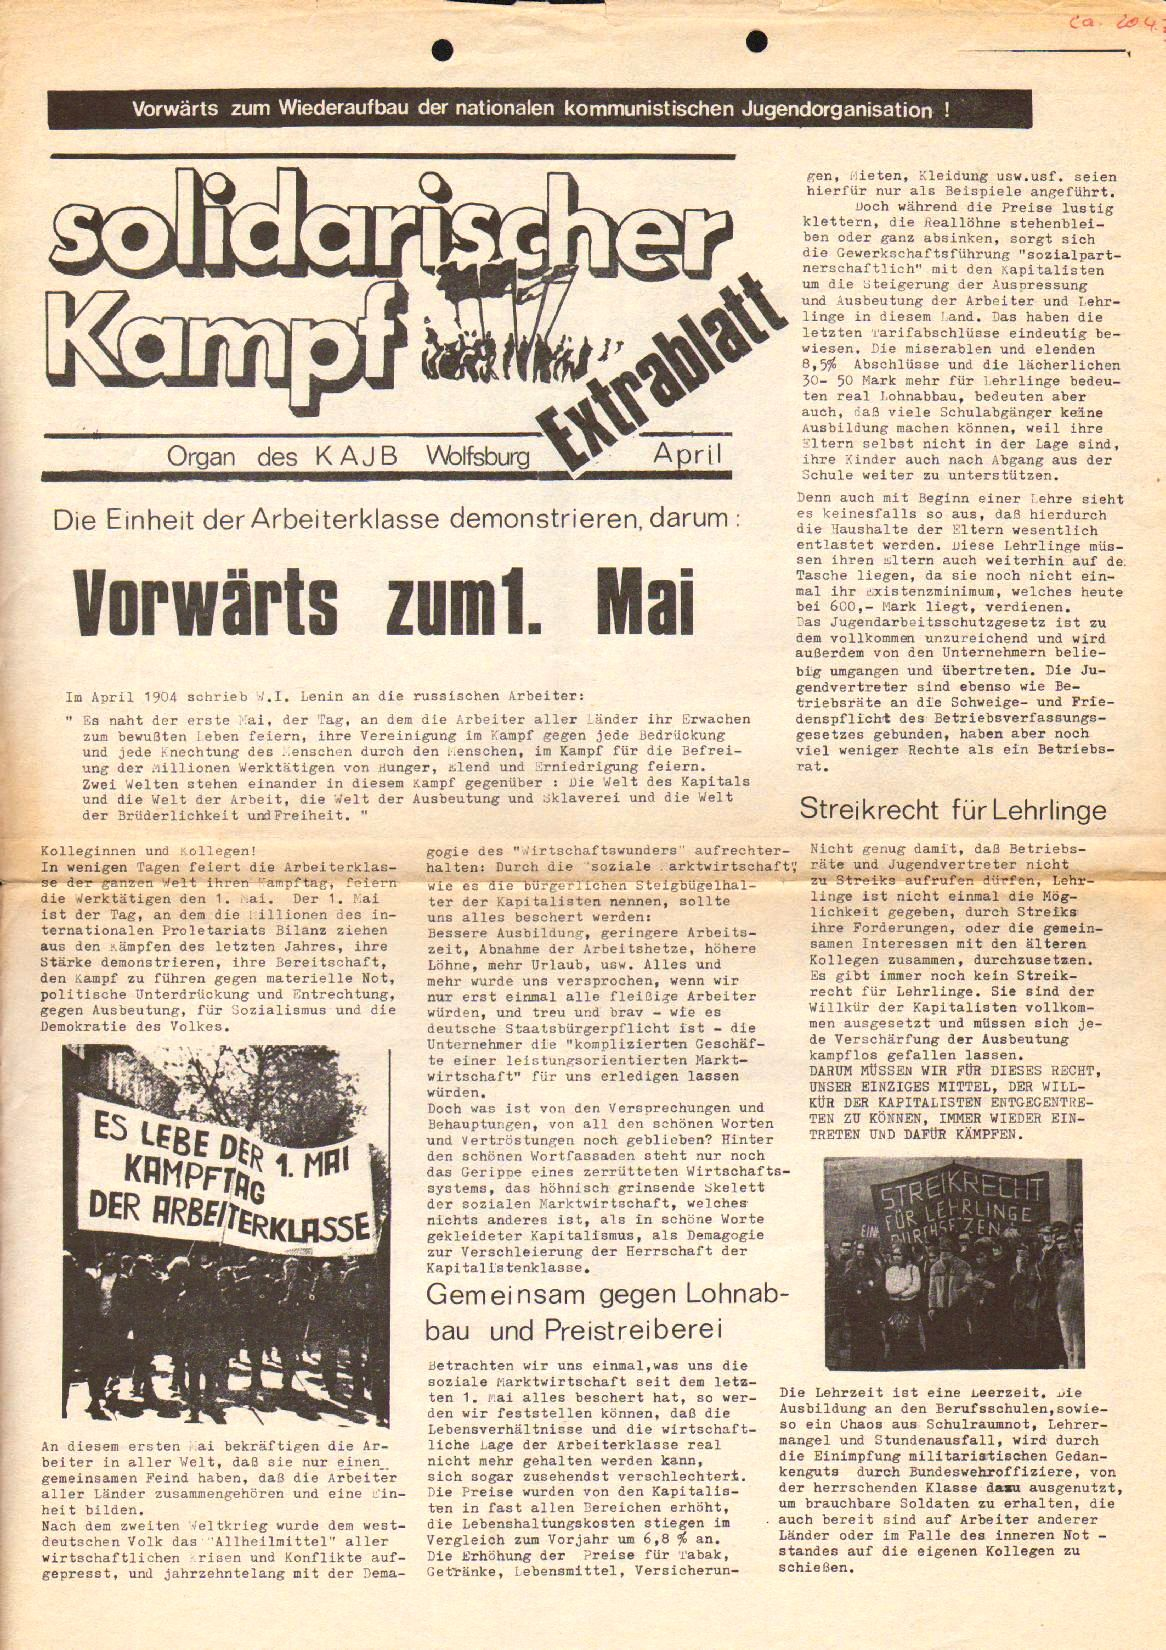 Wolfsburg_KAJB023